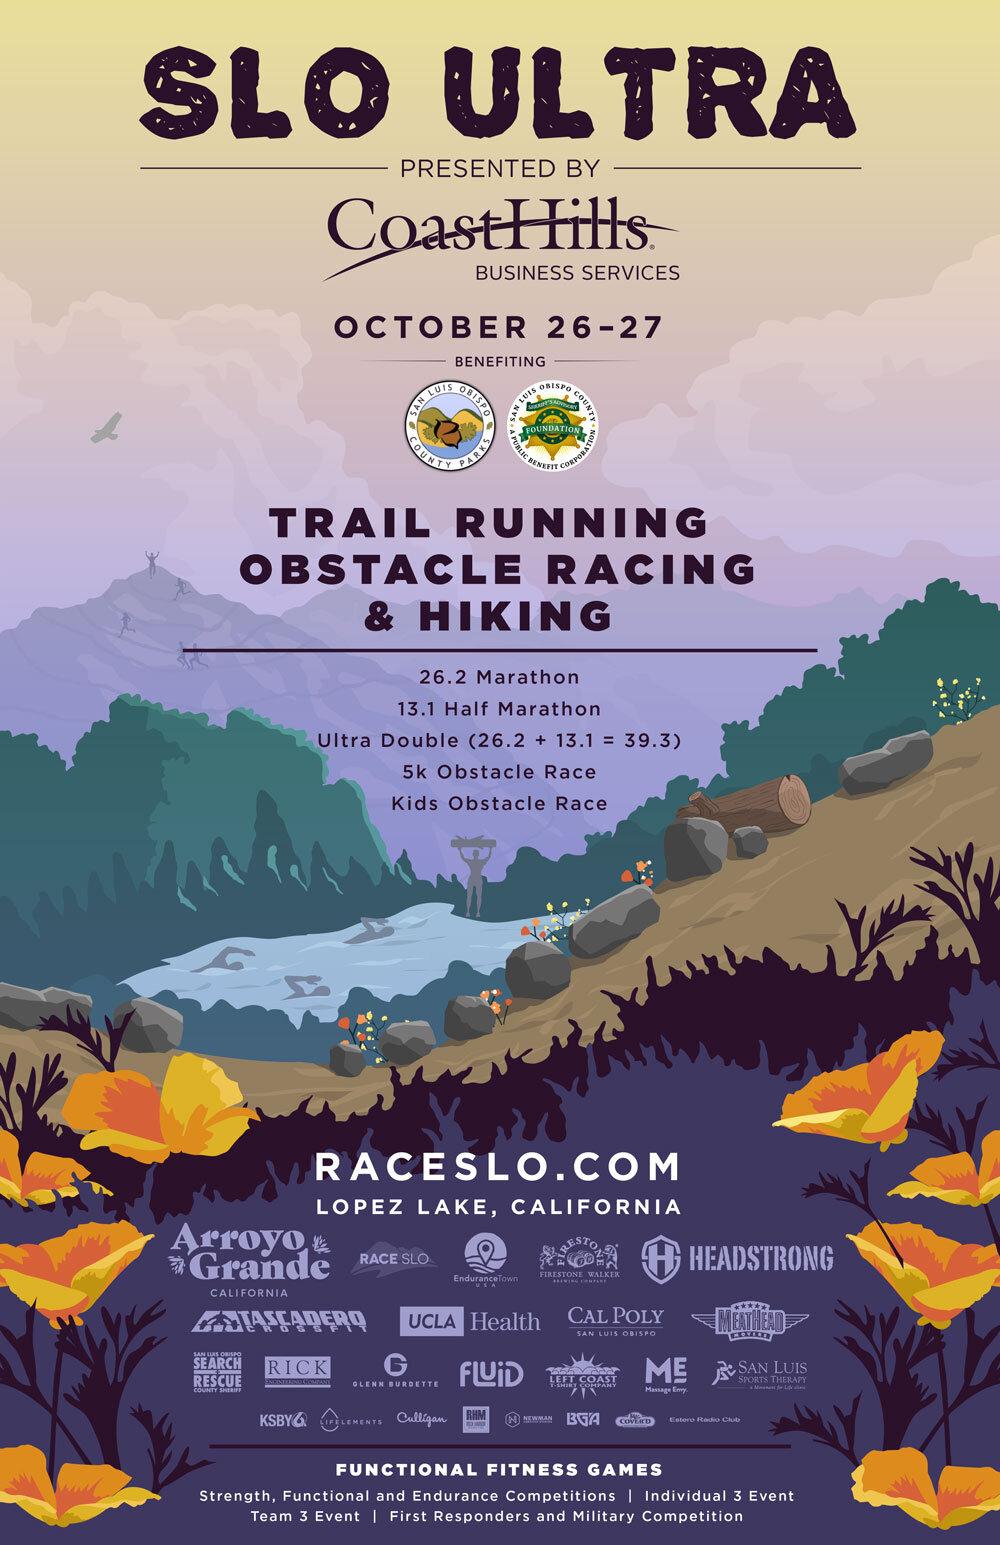 October 26-27, 2019 Arroyo Grande, CA    LEARN MORE      REGISTER TODAY